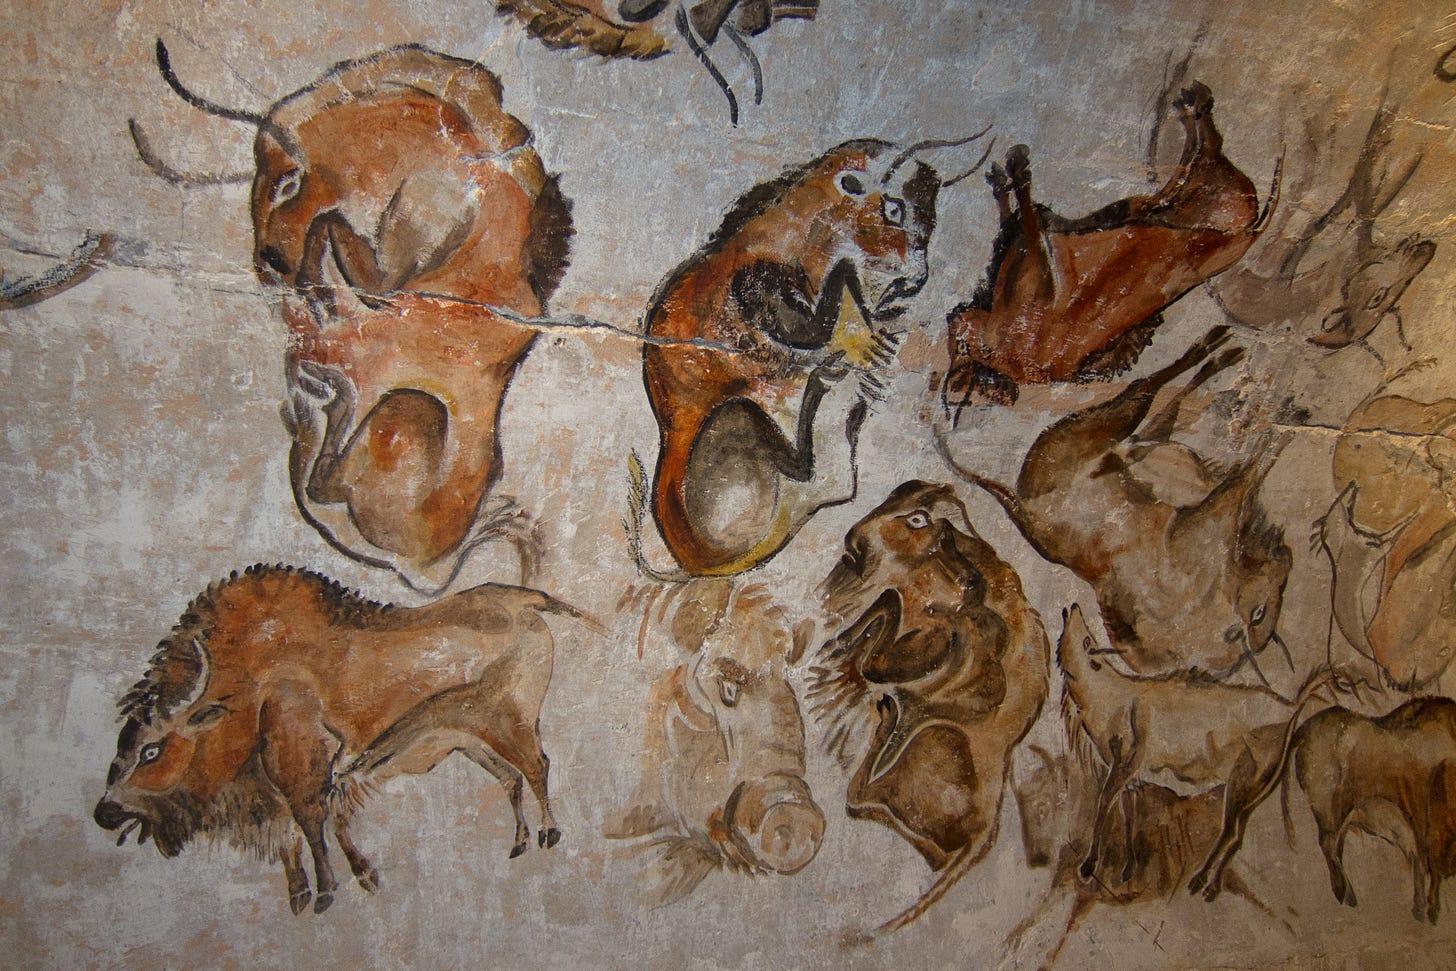 File:Altamira bisons.jpg - Wikimedia Commons